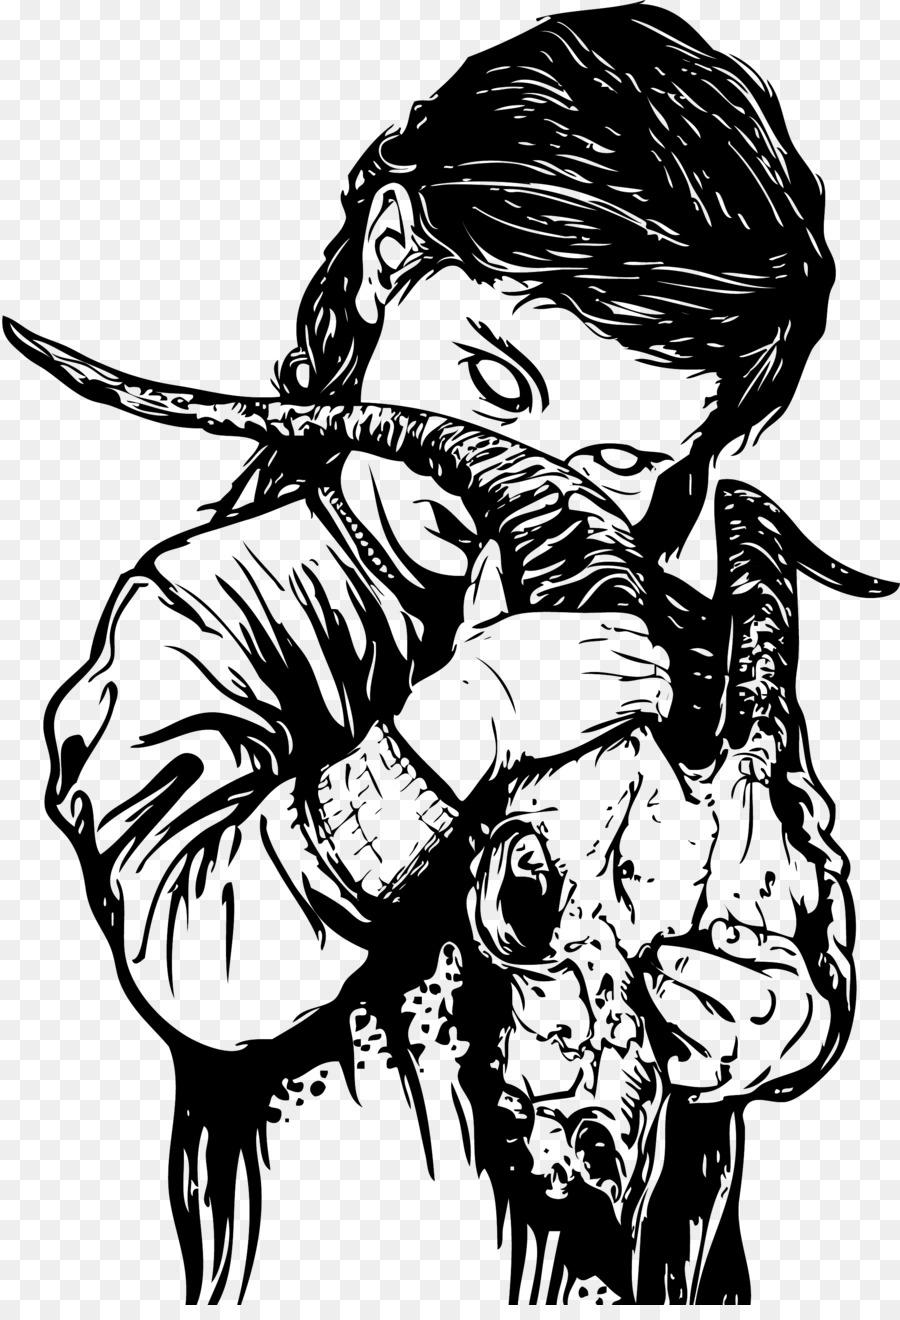 La iglesia de Satanás Satanismo Baphomet Dibujo - satanás Formatos ...